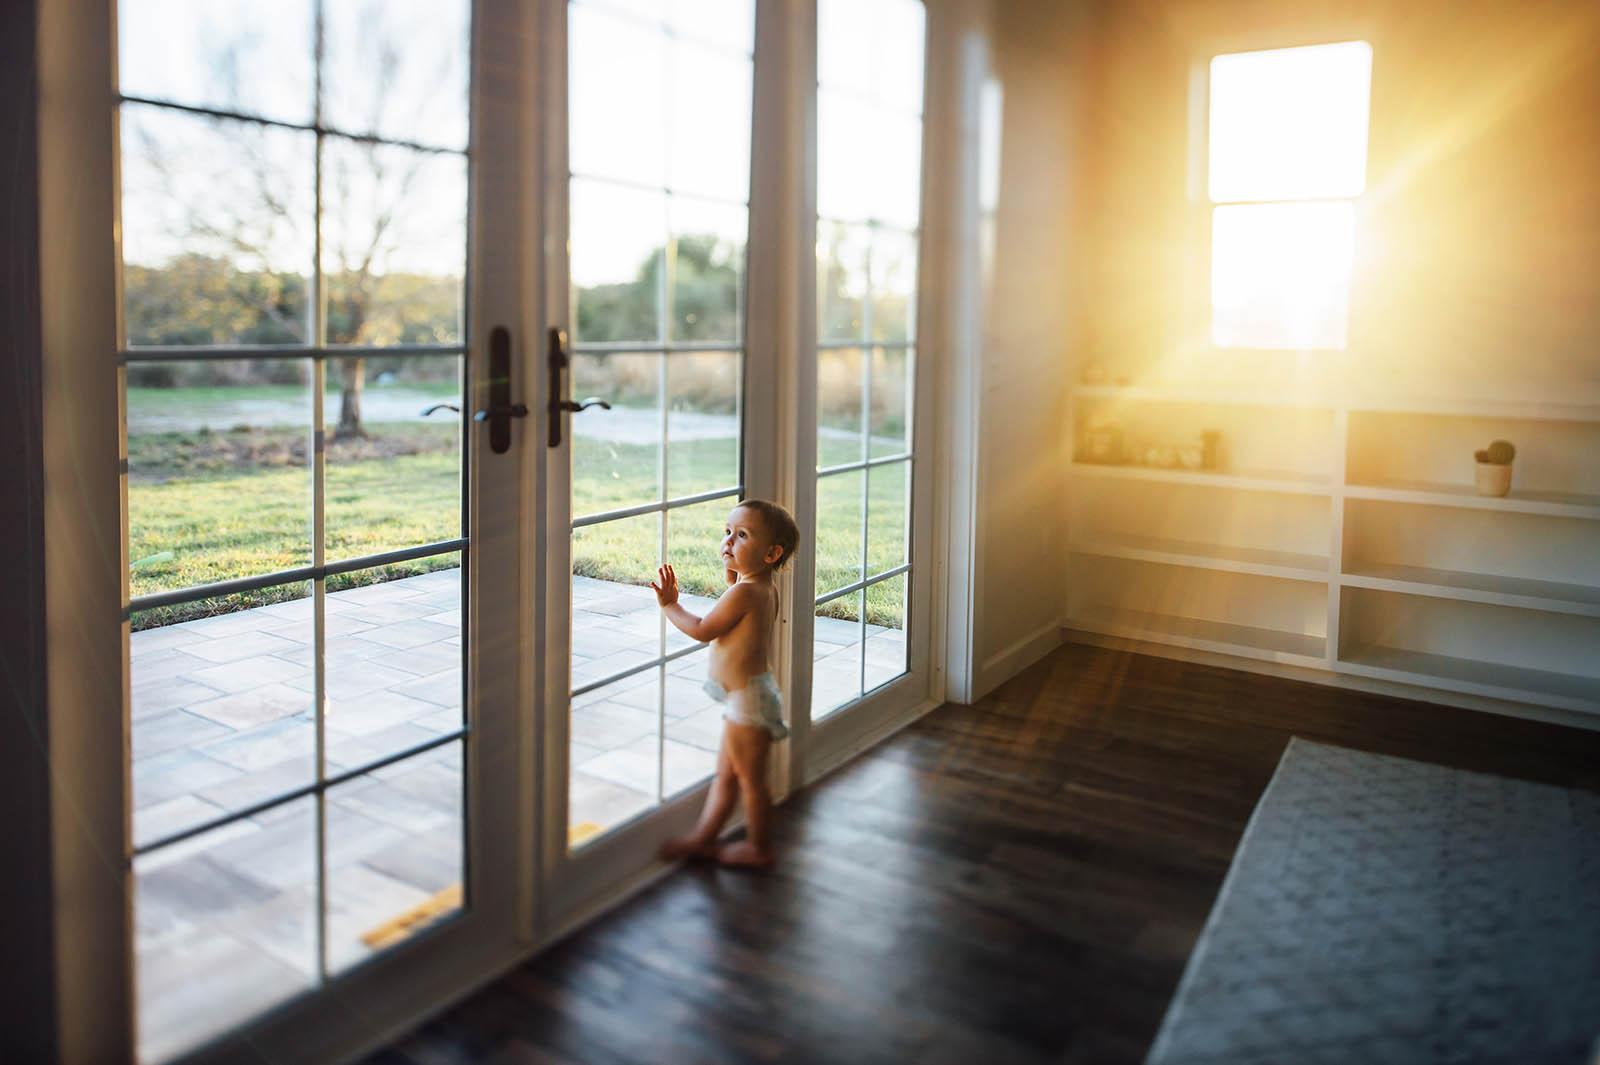 Window light sun flare as baby stands at door